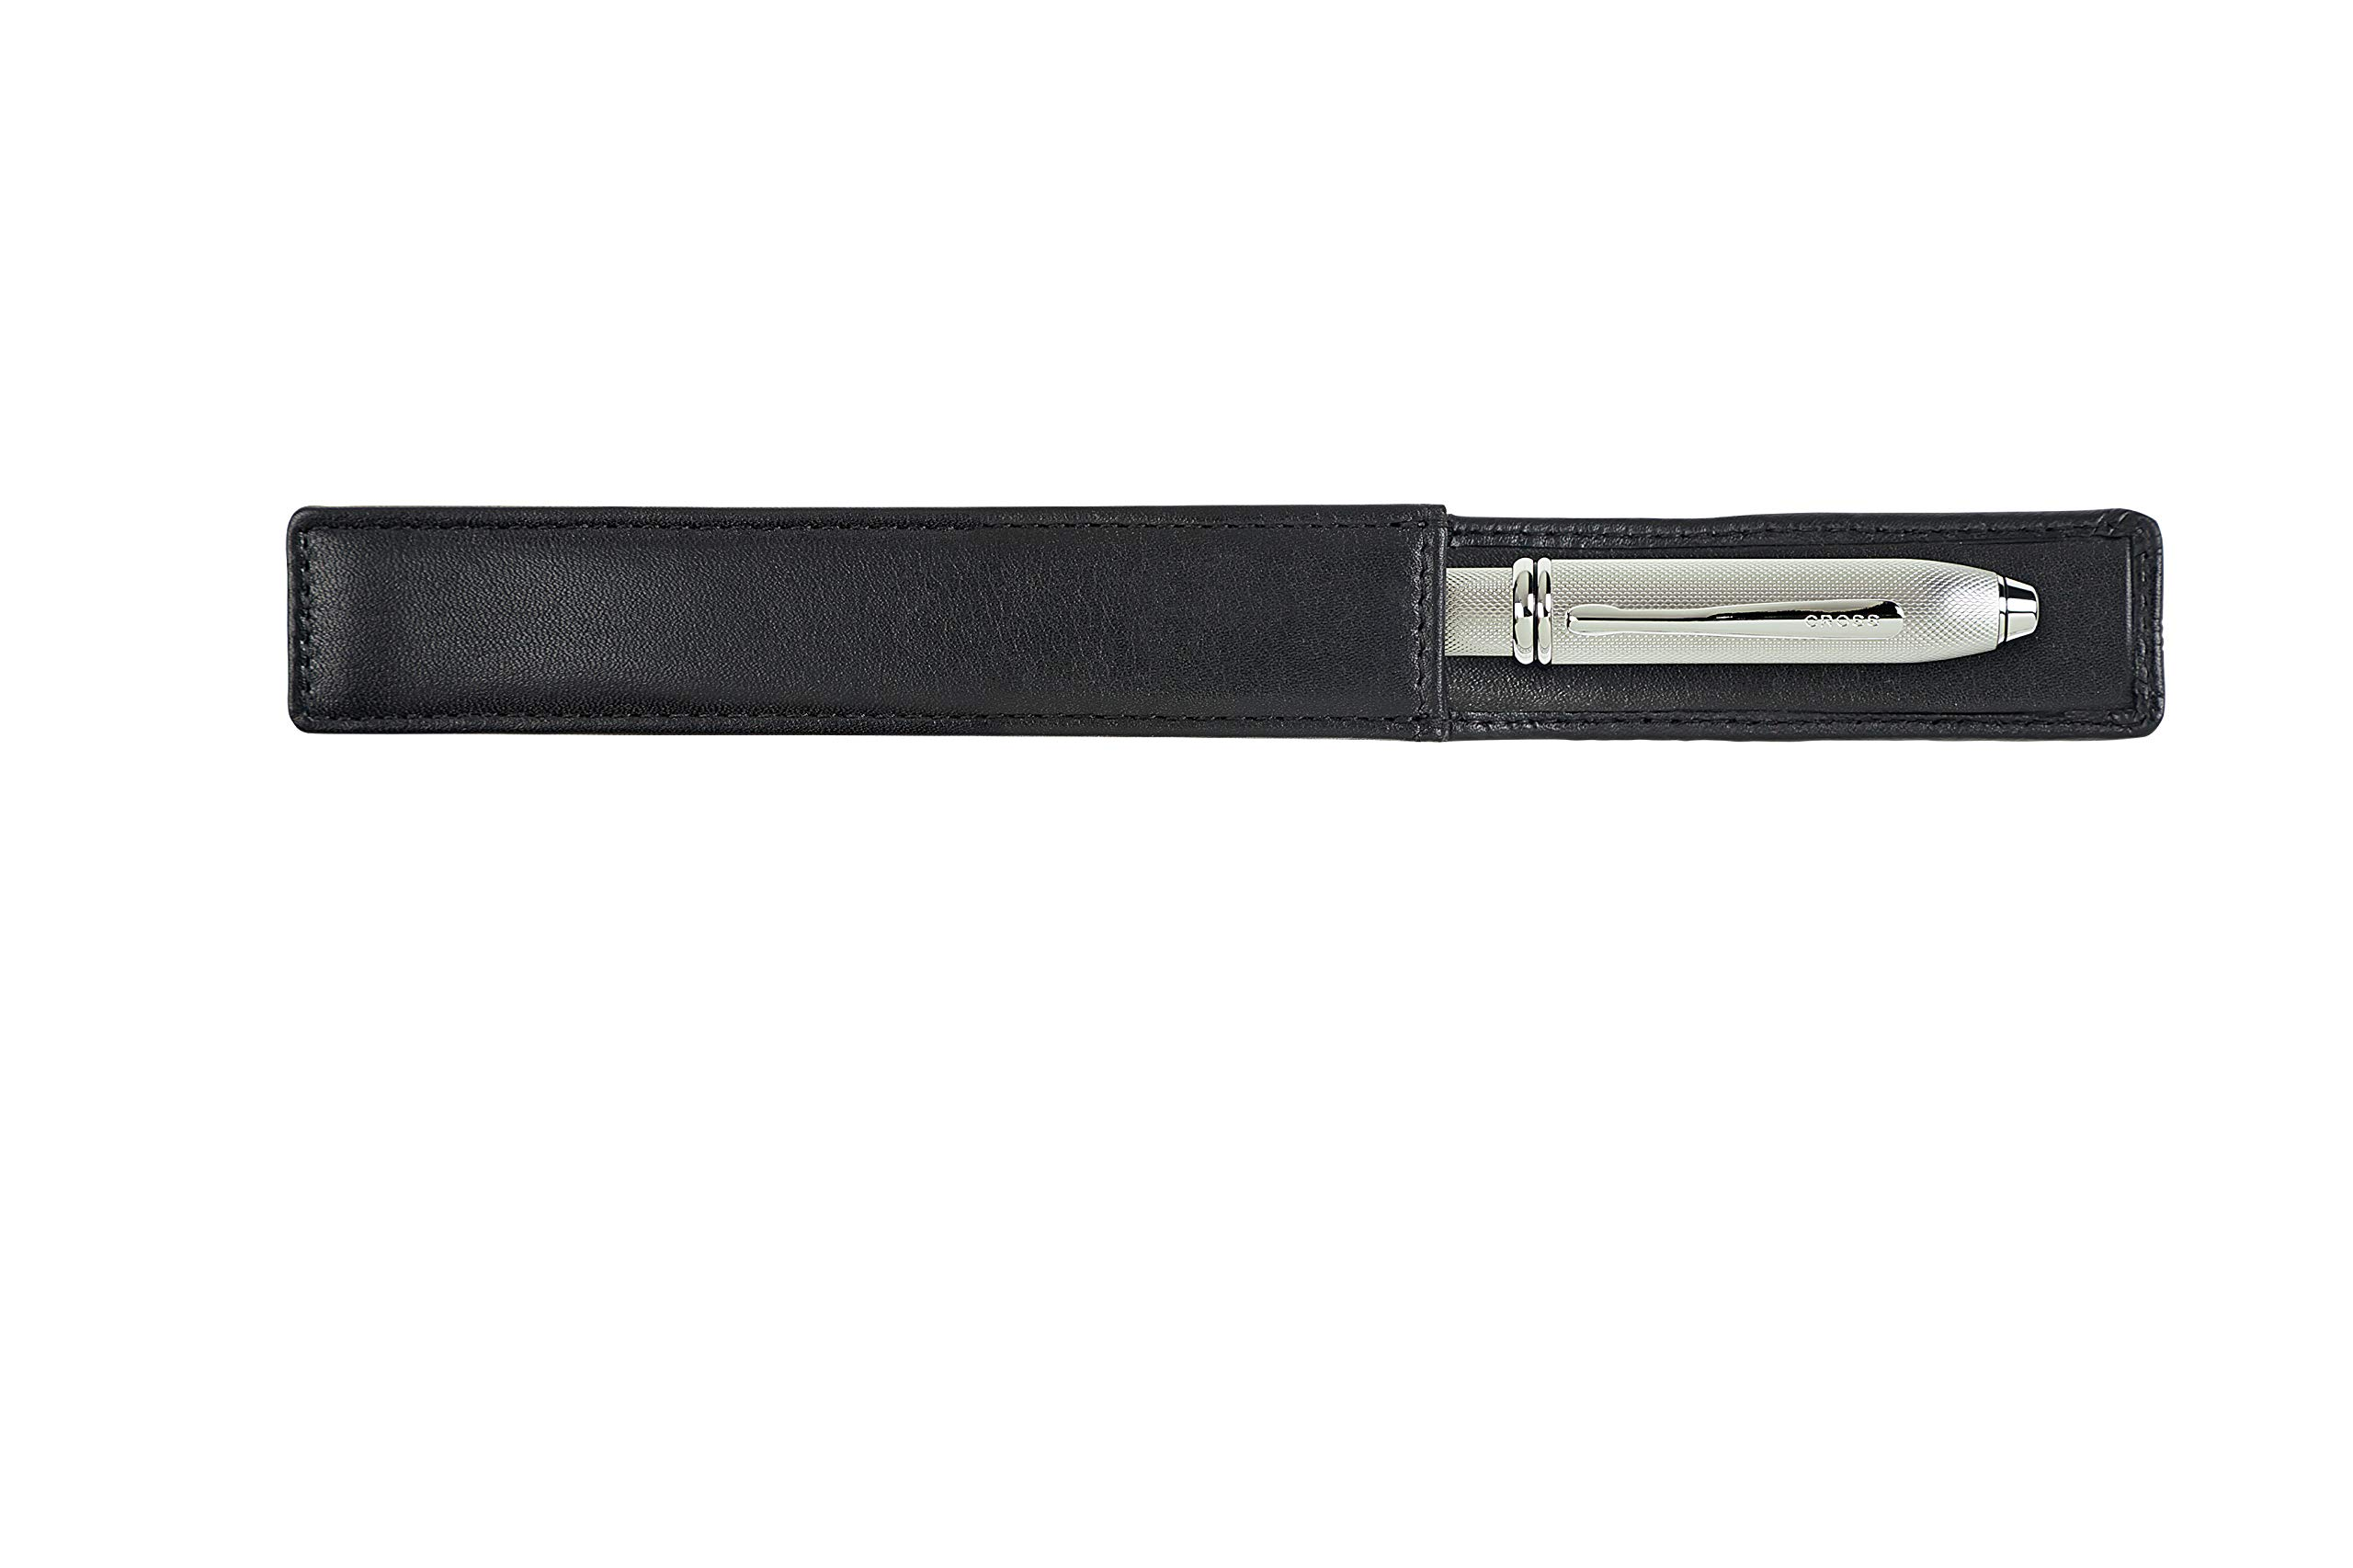 Cross Classic Century Single Pen Case Black Leather (pen not included) by Cross (Image #5)